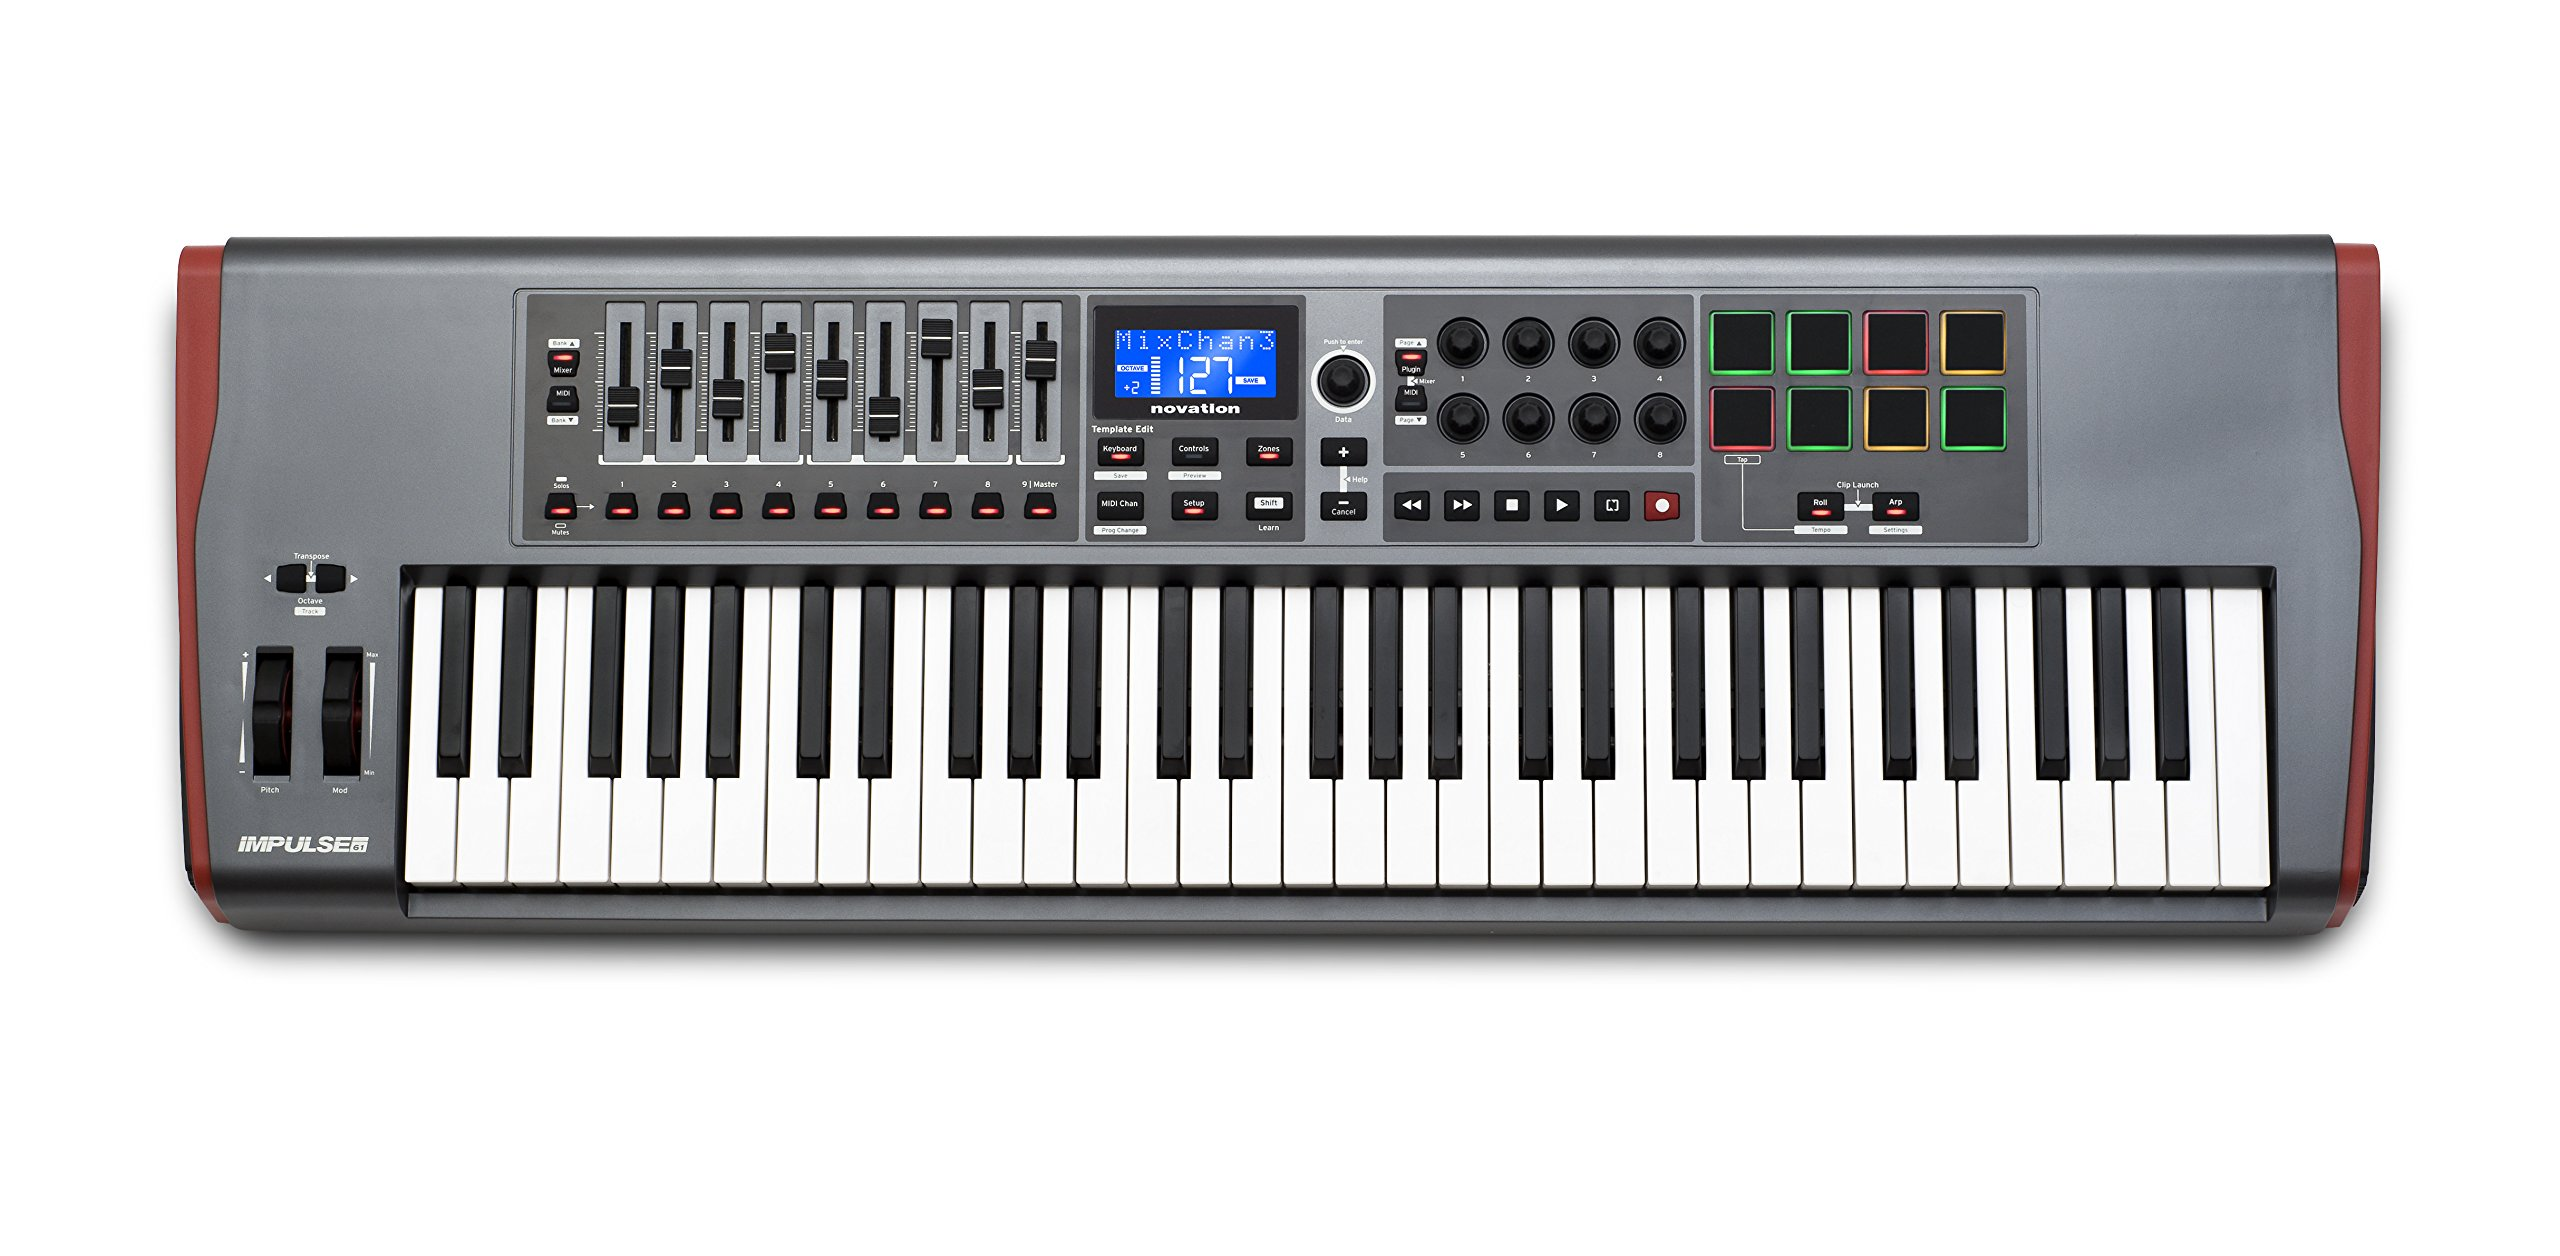 Novation Impulse 61 USB Midi Controller Keyboard, 61 Keys by Novation